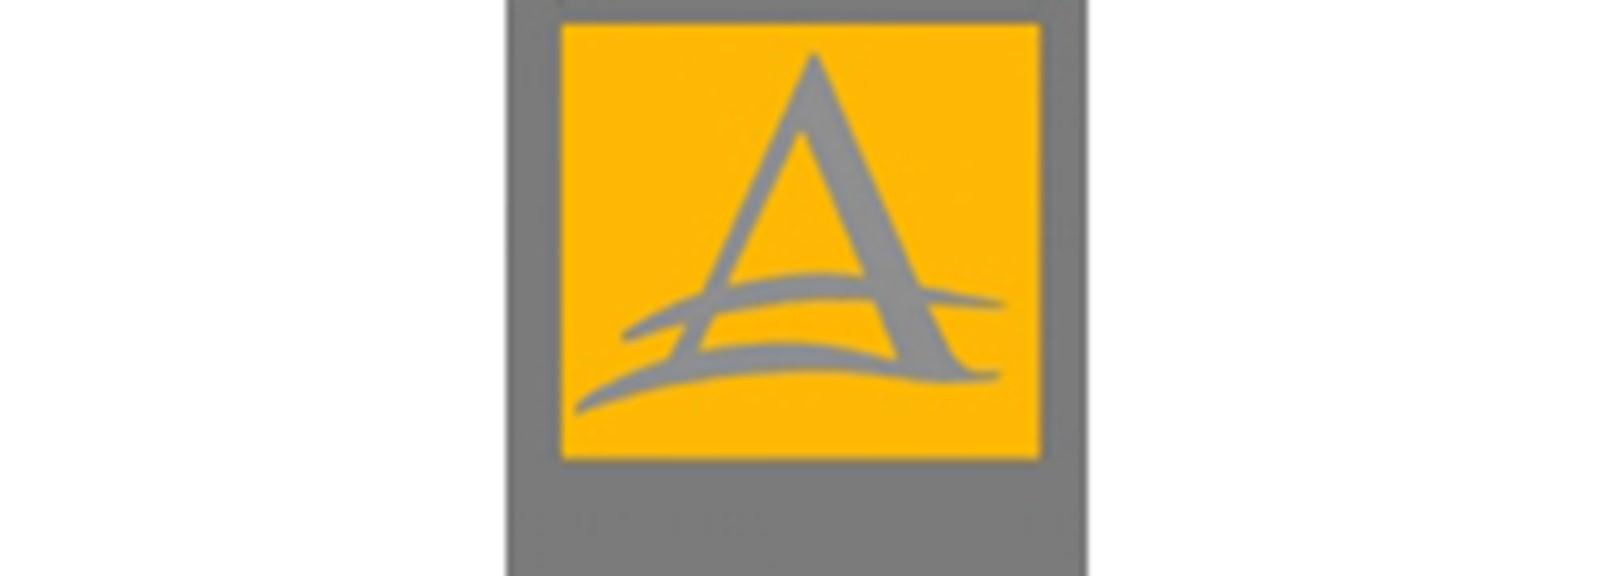 Aeroyacht Ltd.